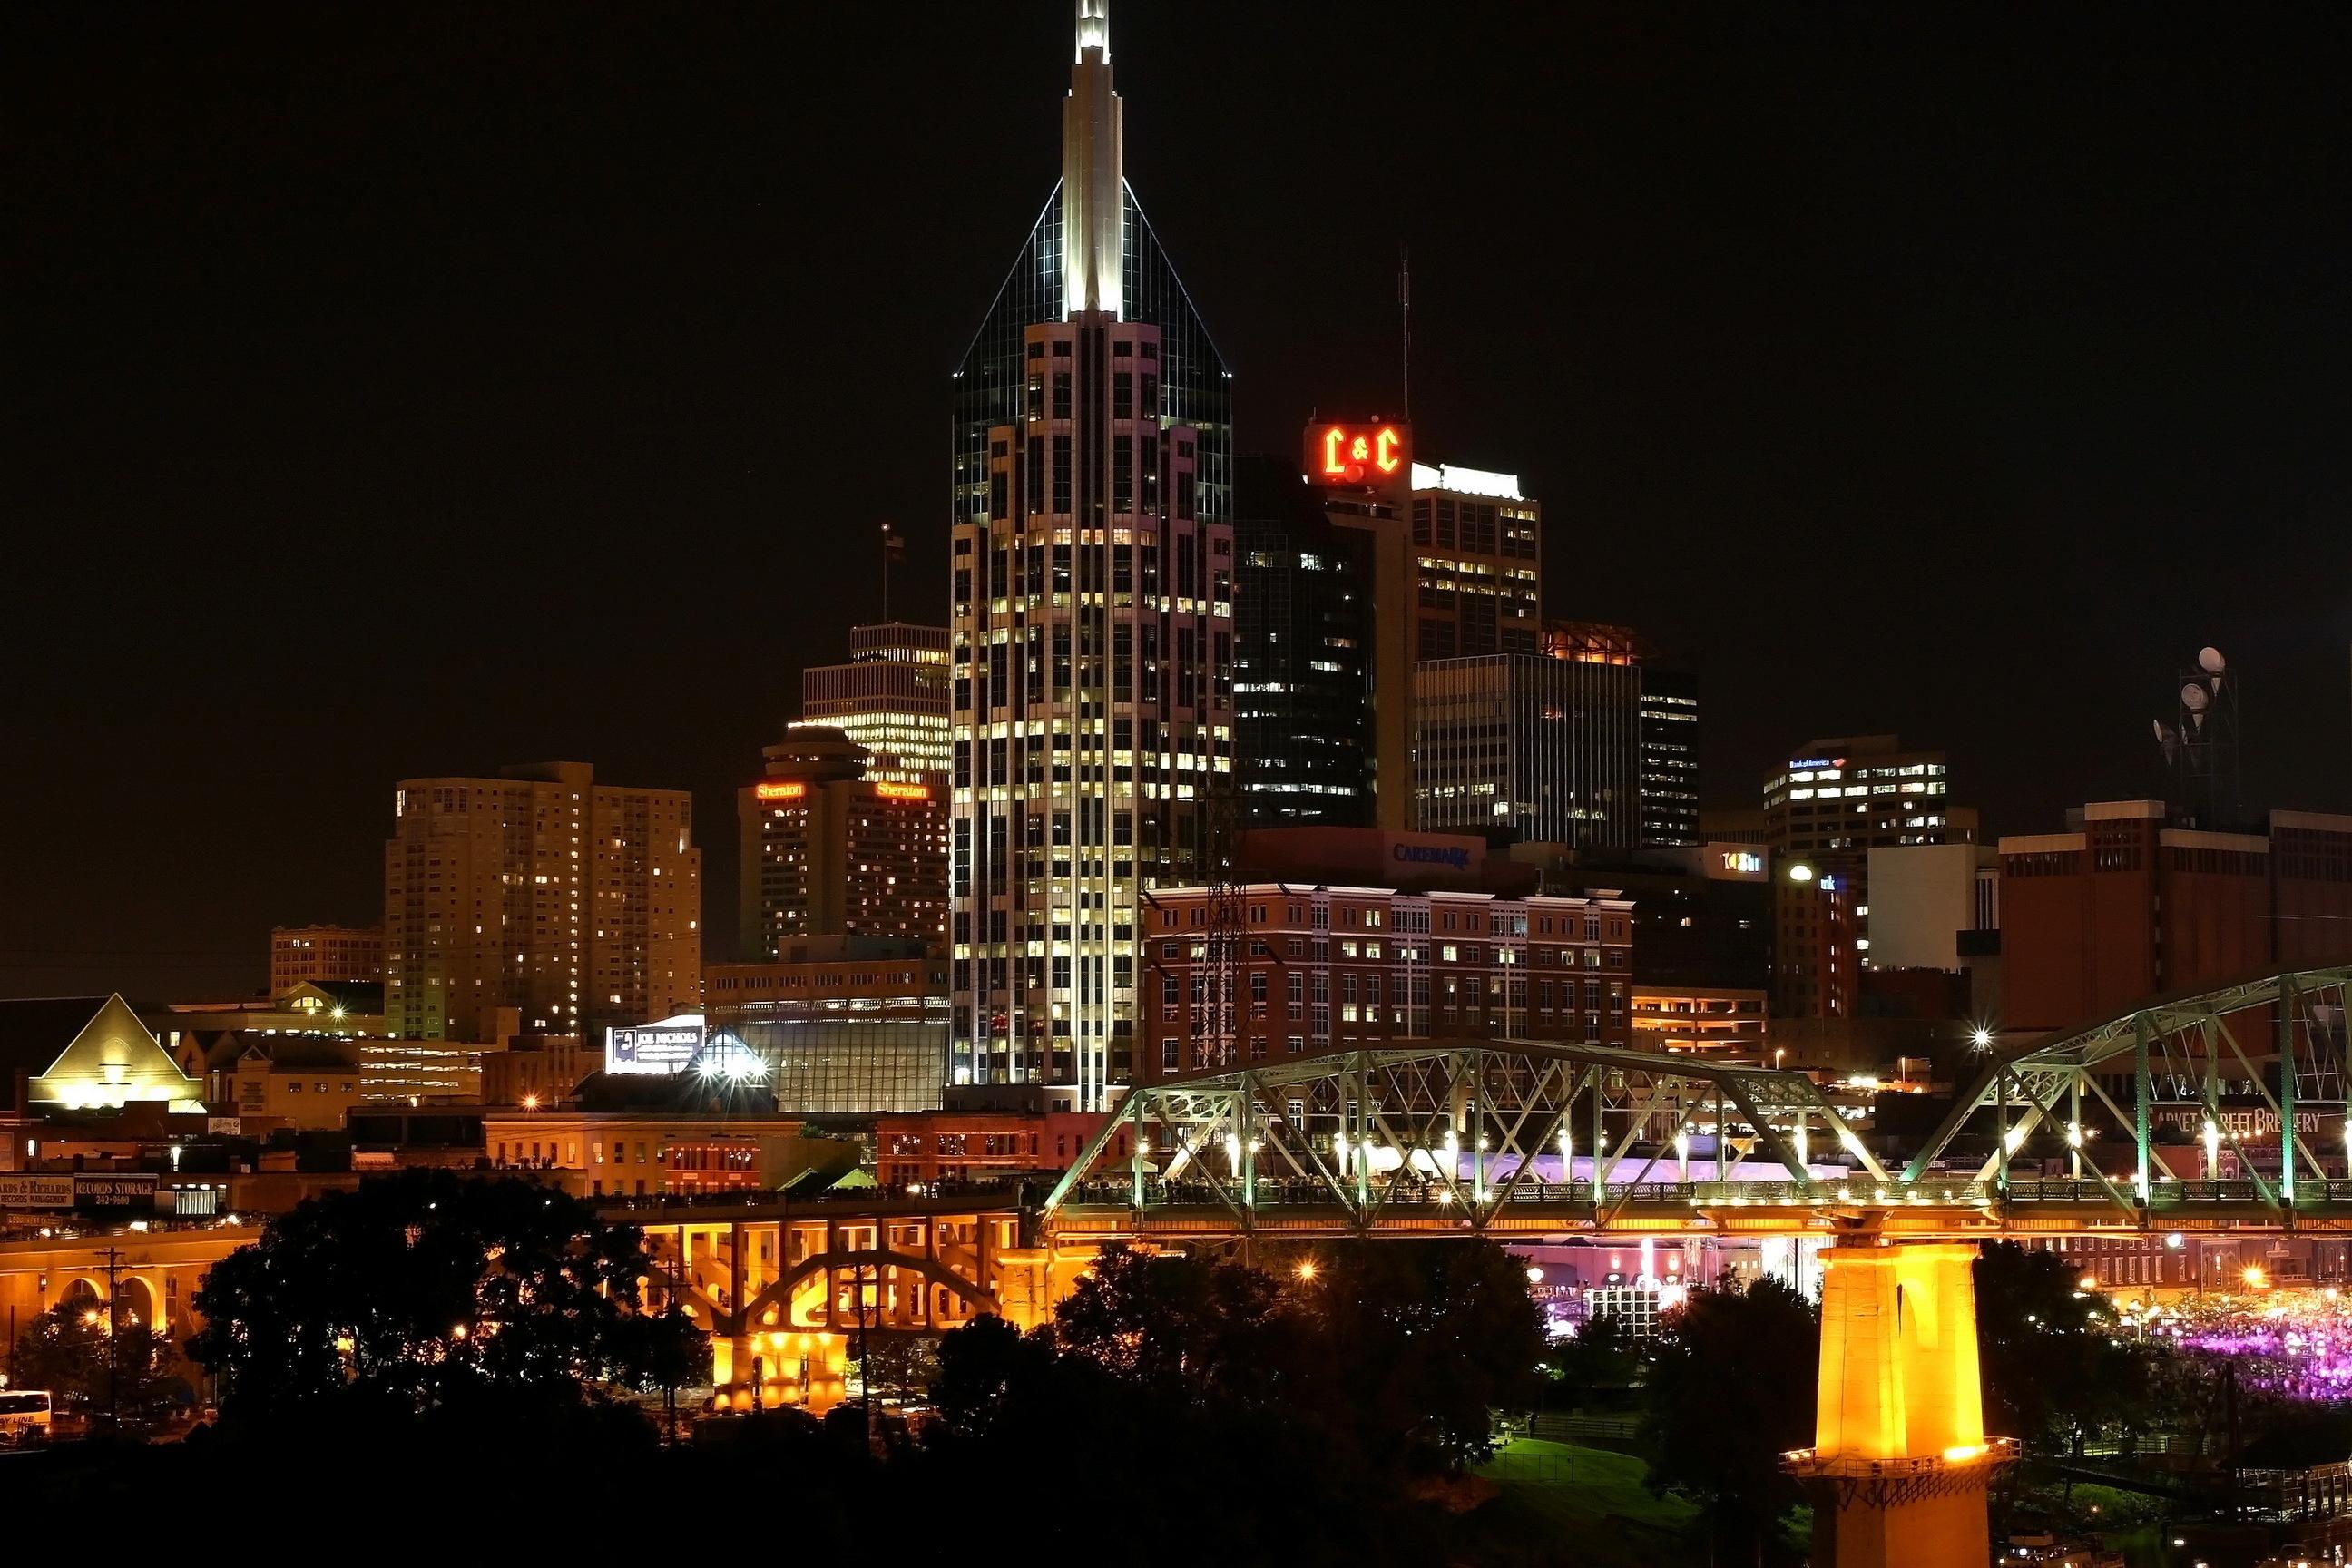 Wallpaper Trees Lights City Cityscape Night Skyline